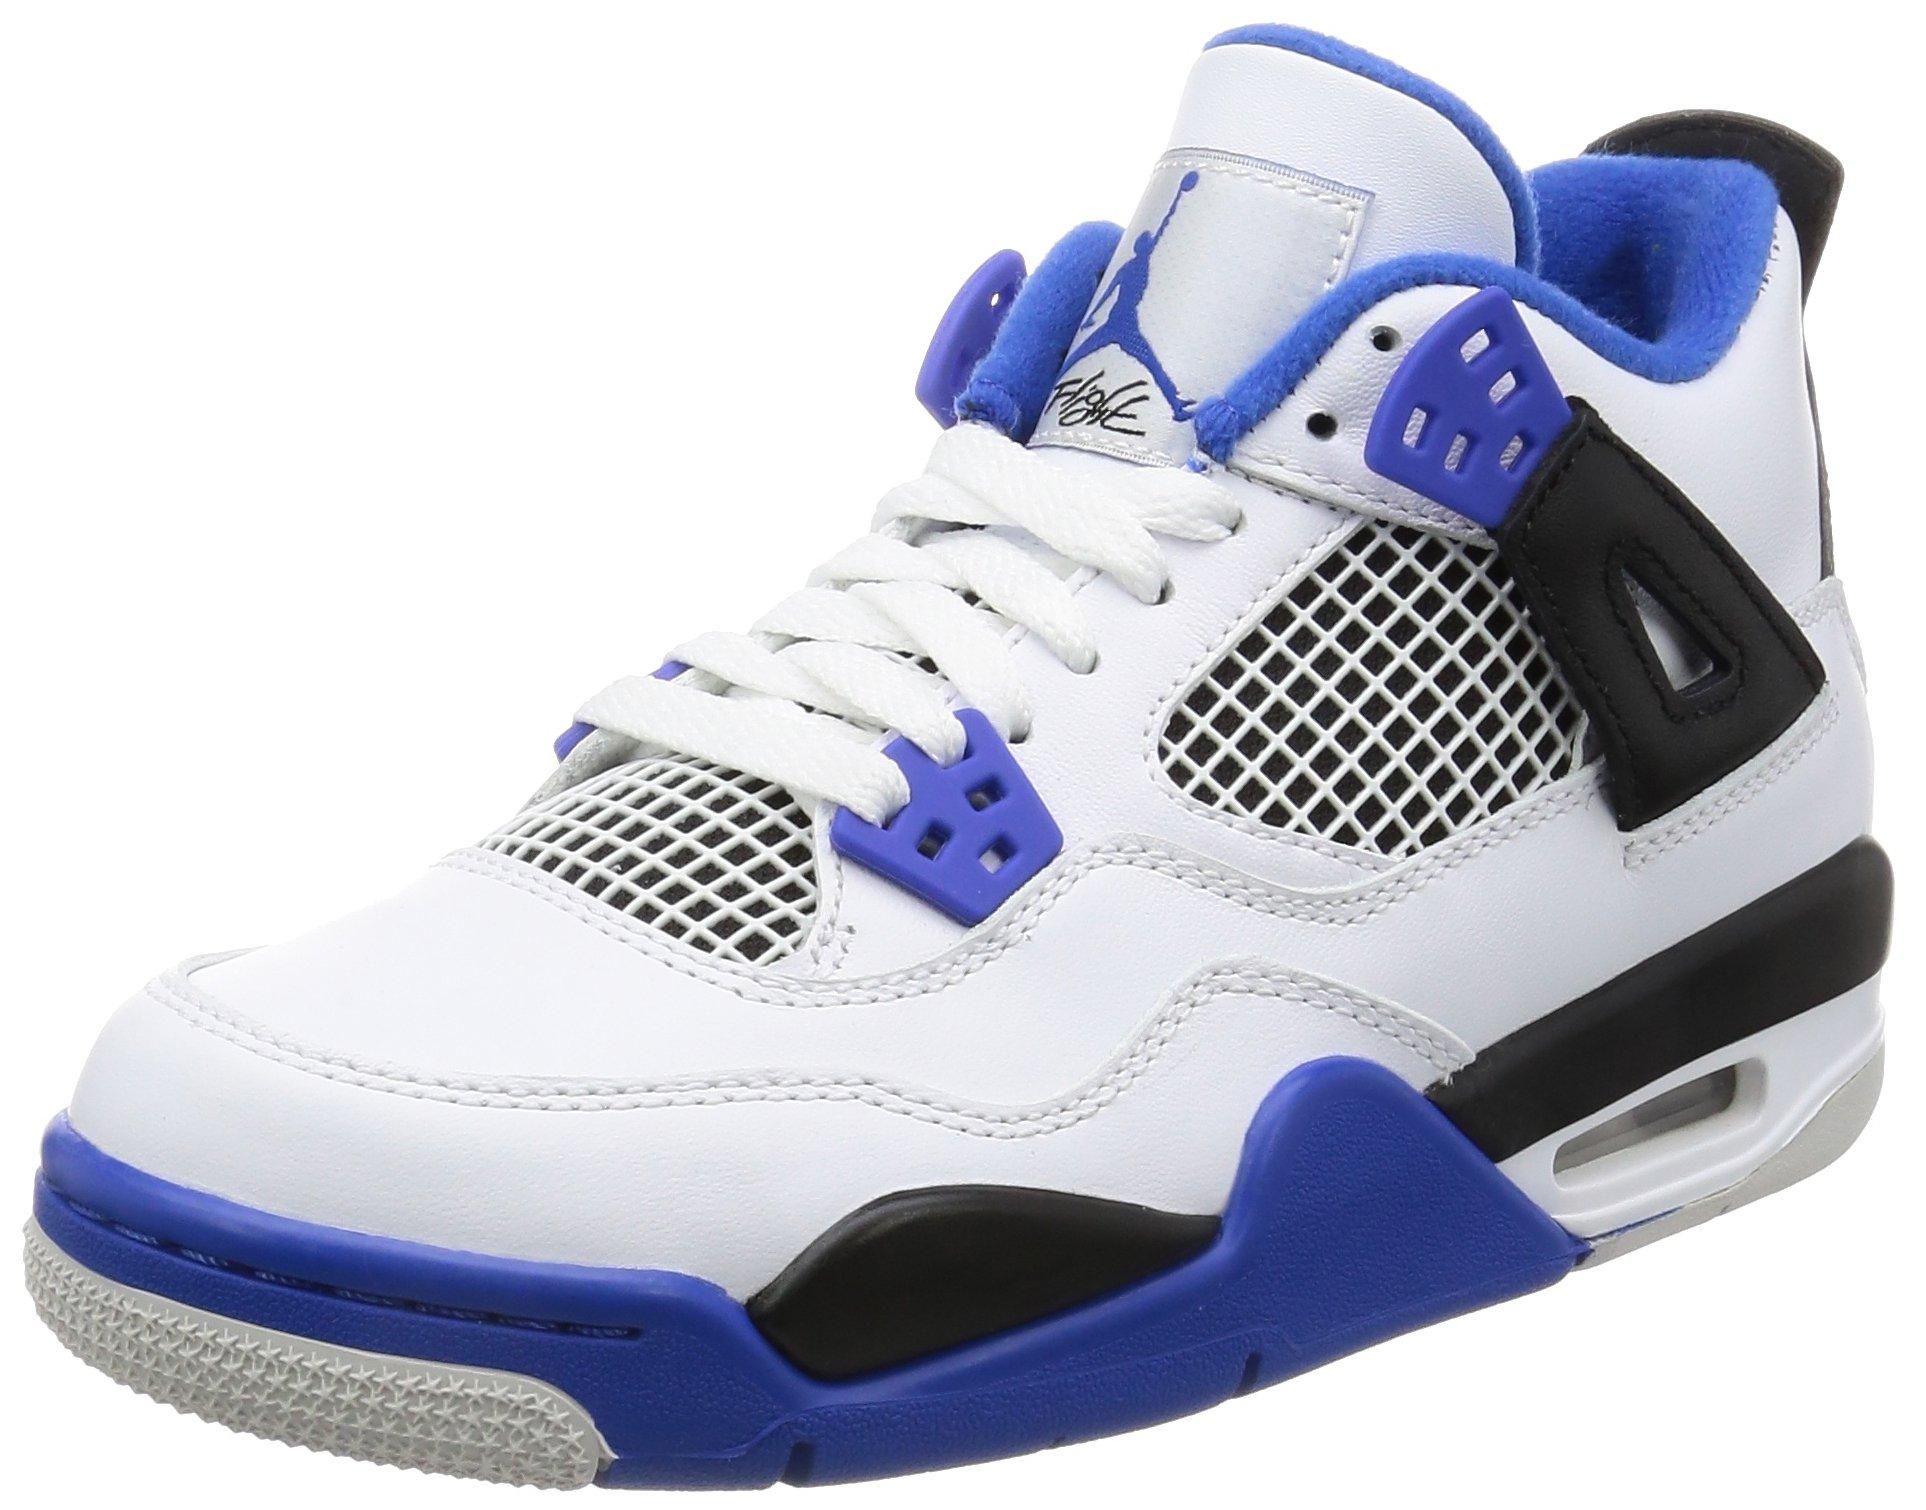 Nike Air Jordan 4 Retro BG Big Kids' Basketball Shoes White/Game Royal/Black, 6.5 by Jordan